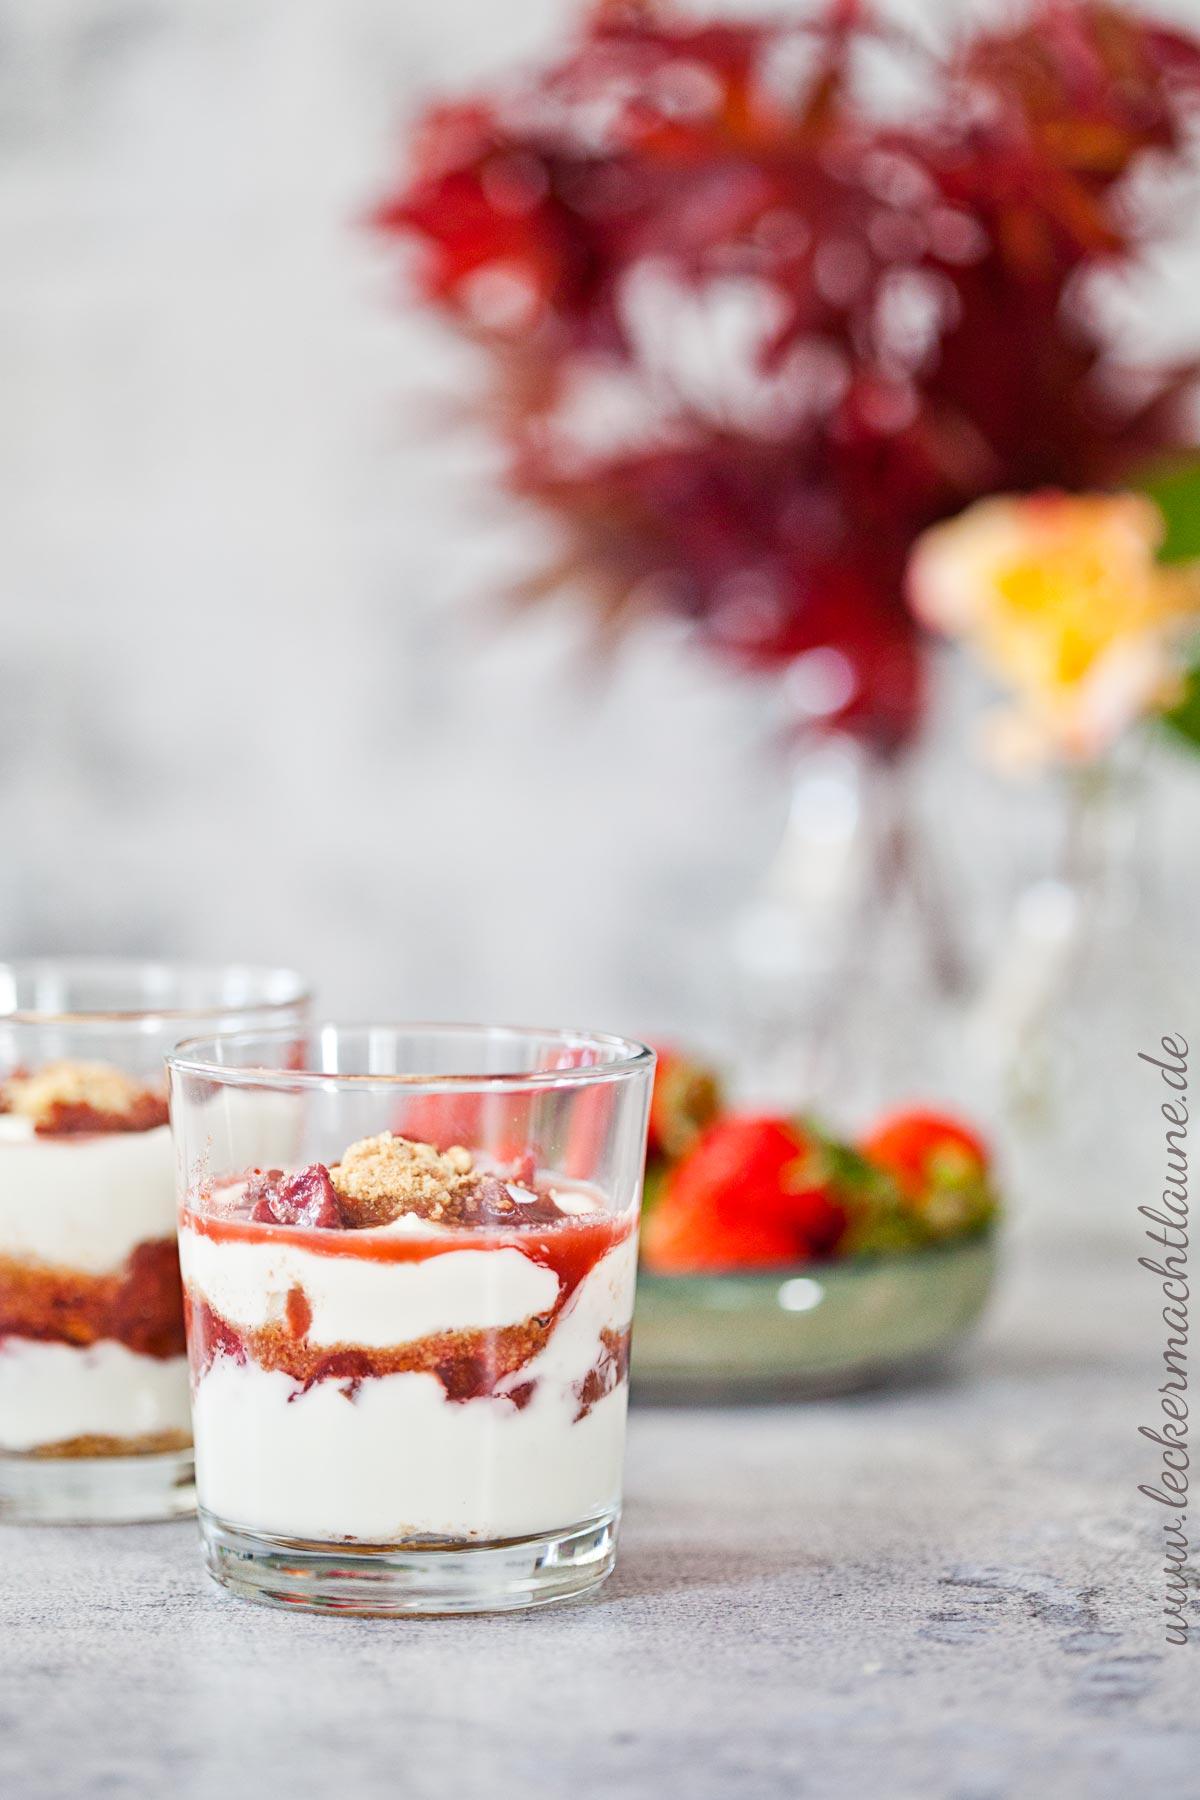 Cremiges Erdbeer Rhabarber Dessert Lecker